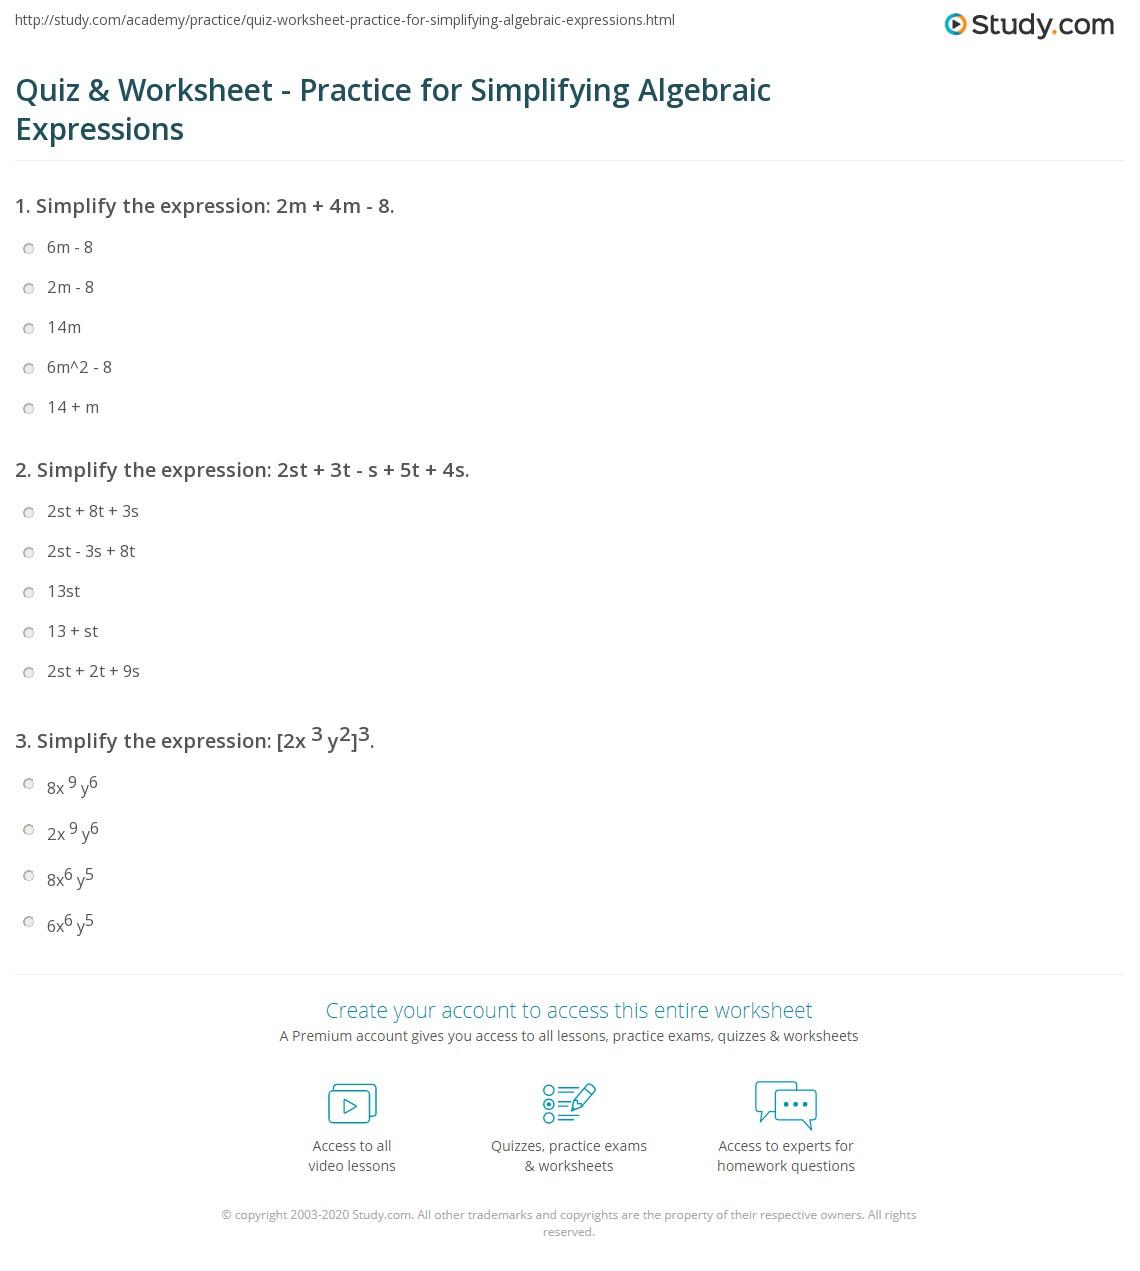 hight resolution of Quiz \u0026 Worksheet - Practice for Simplifying Algebraic Expressions    Study.com